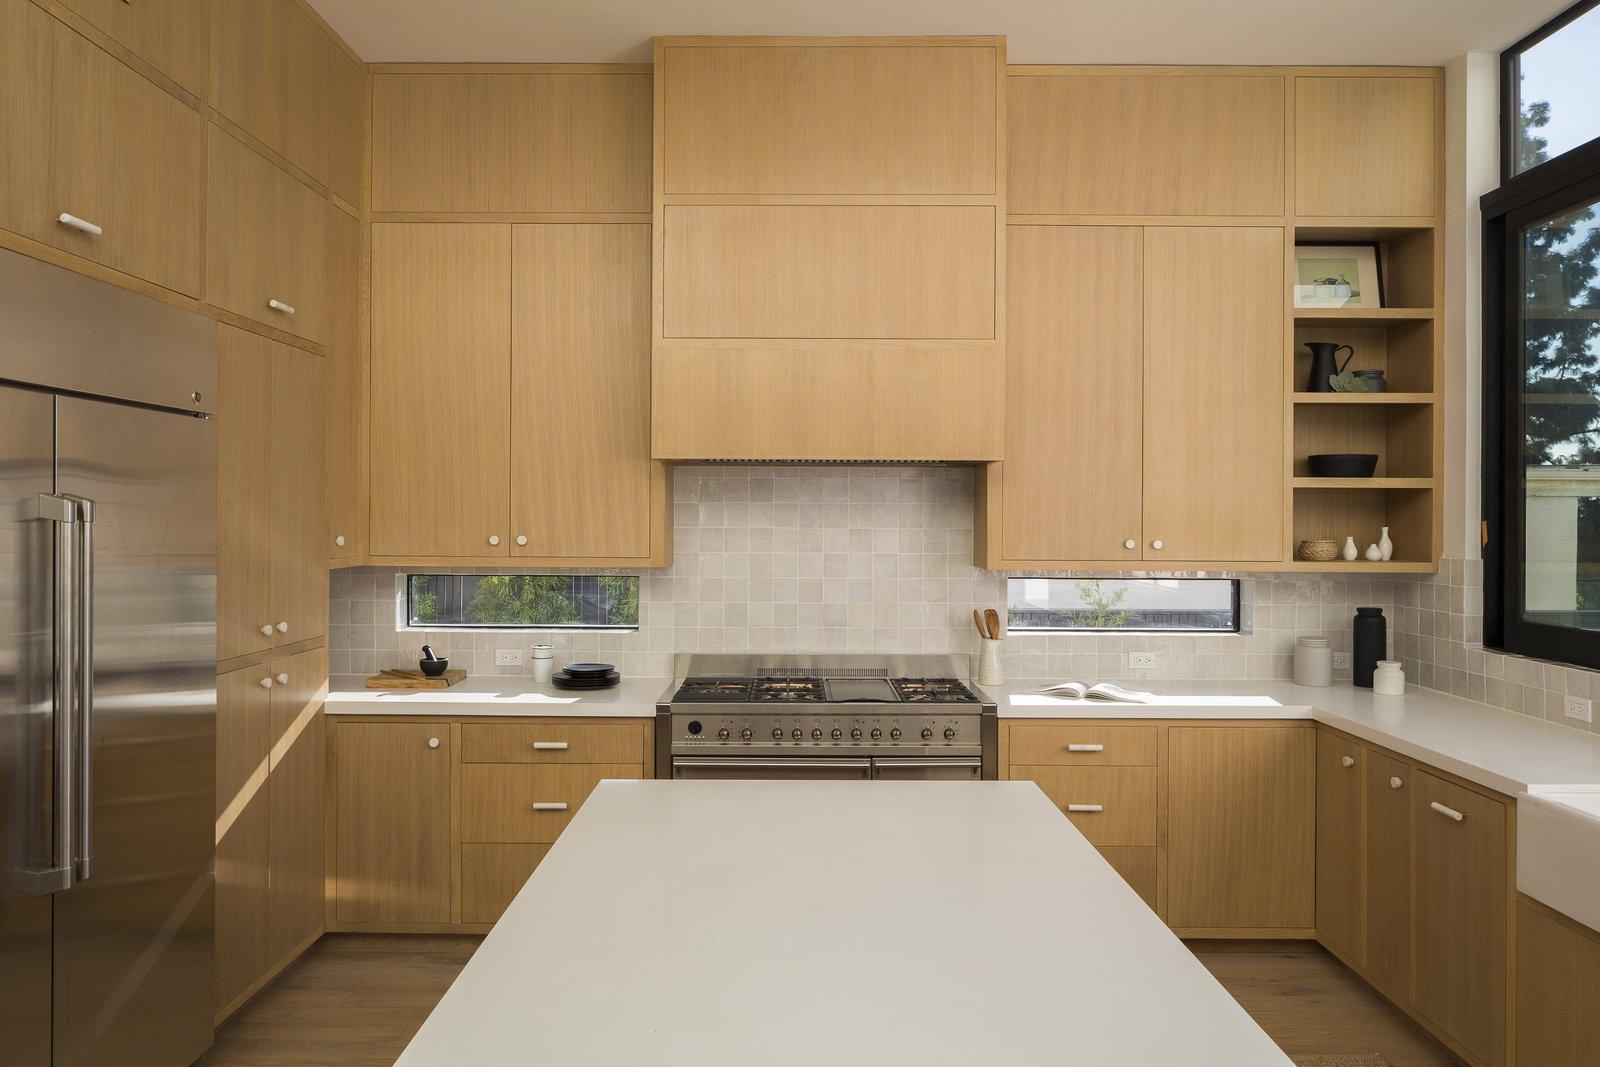 Kitchen, Vessel Sink, Range, Ceramic Tile Backsplashe, Wood Cabinet, Engineered Quartz Counter, Medium Hardwood Floor, and Refrigerator Kitchen  SL House by ANX / Aaron Neubert Architects